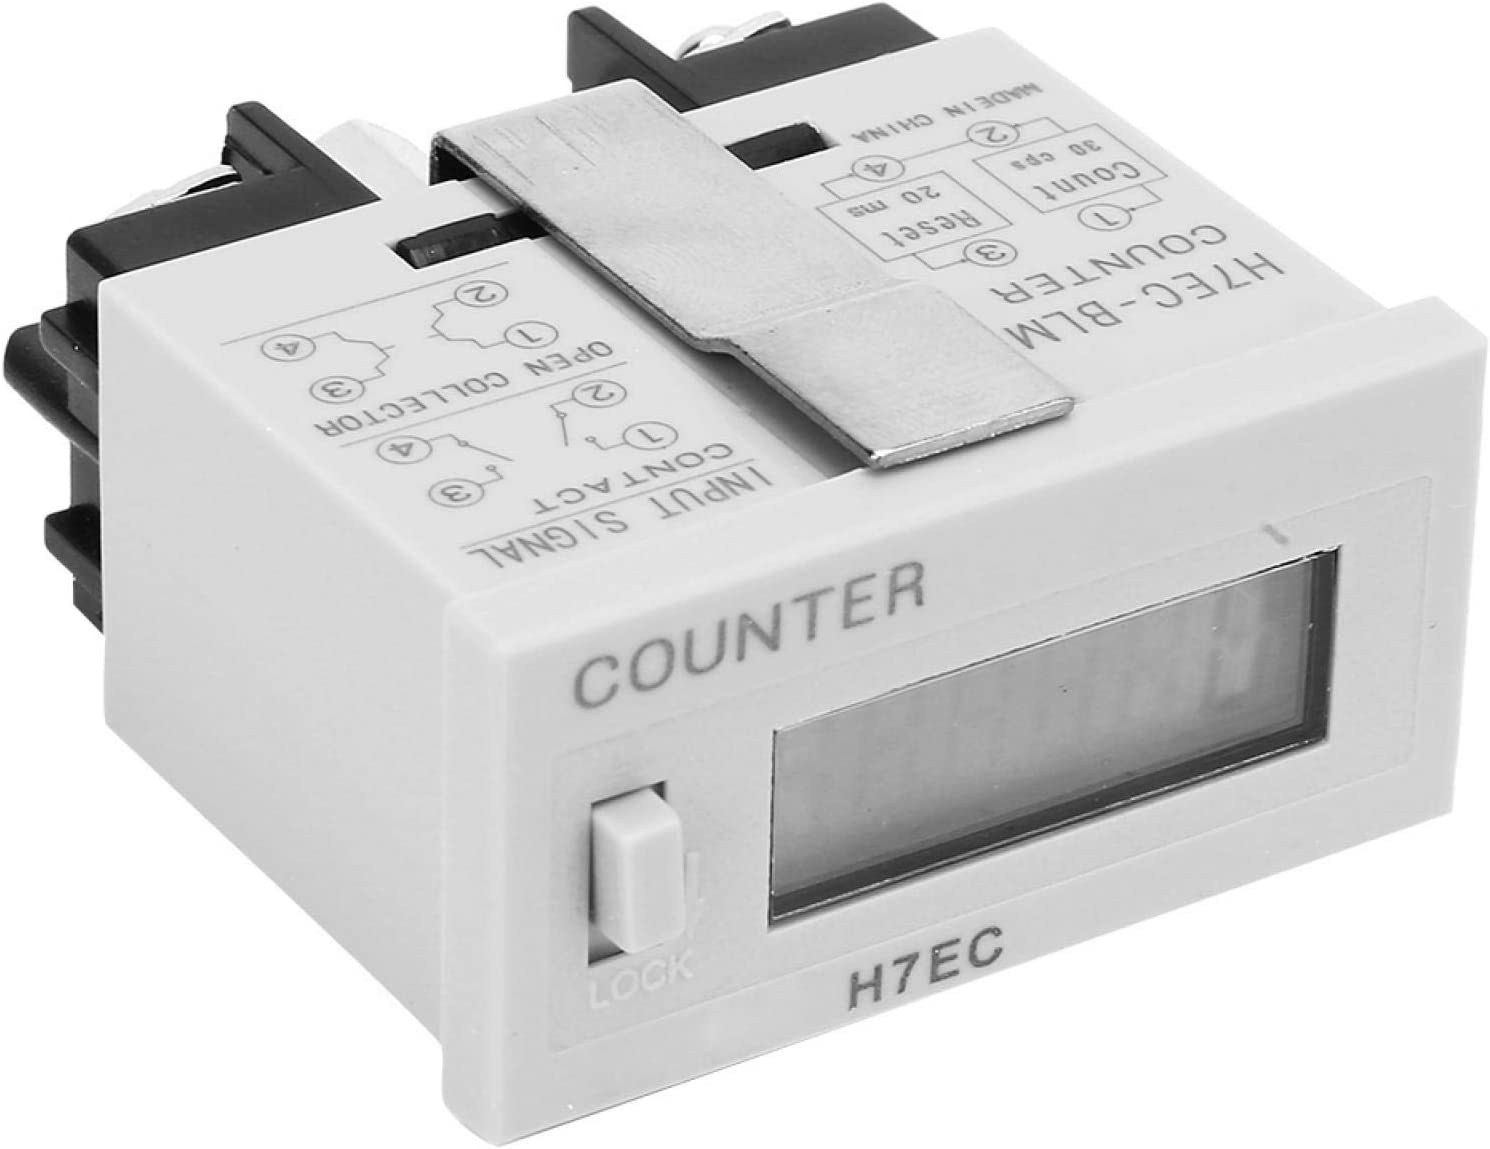 Jeanoko Digital Totalizer 6-Digit Counter for Electrical